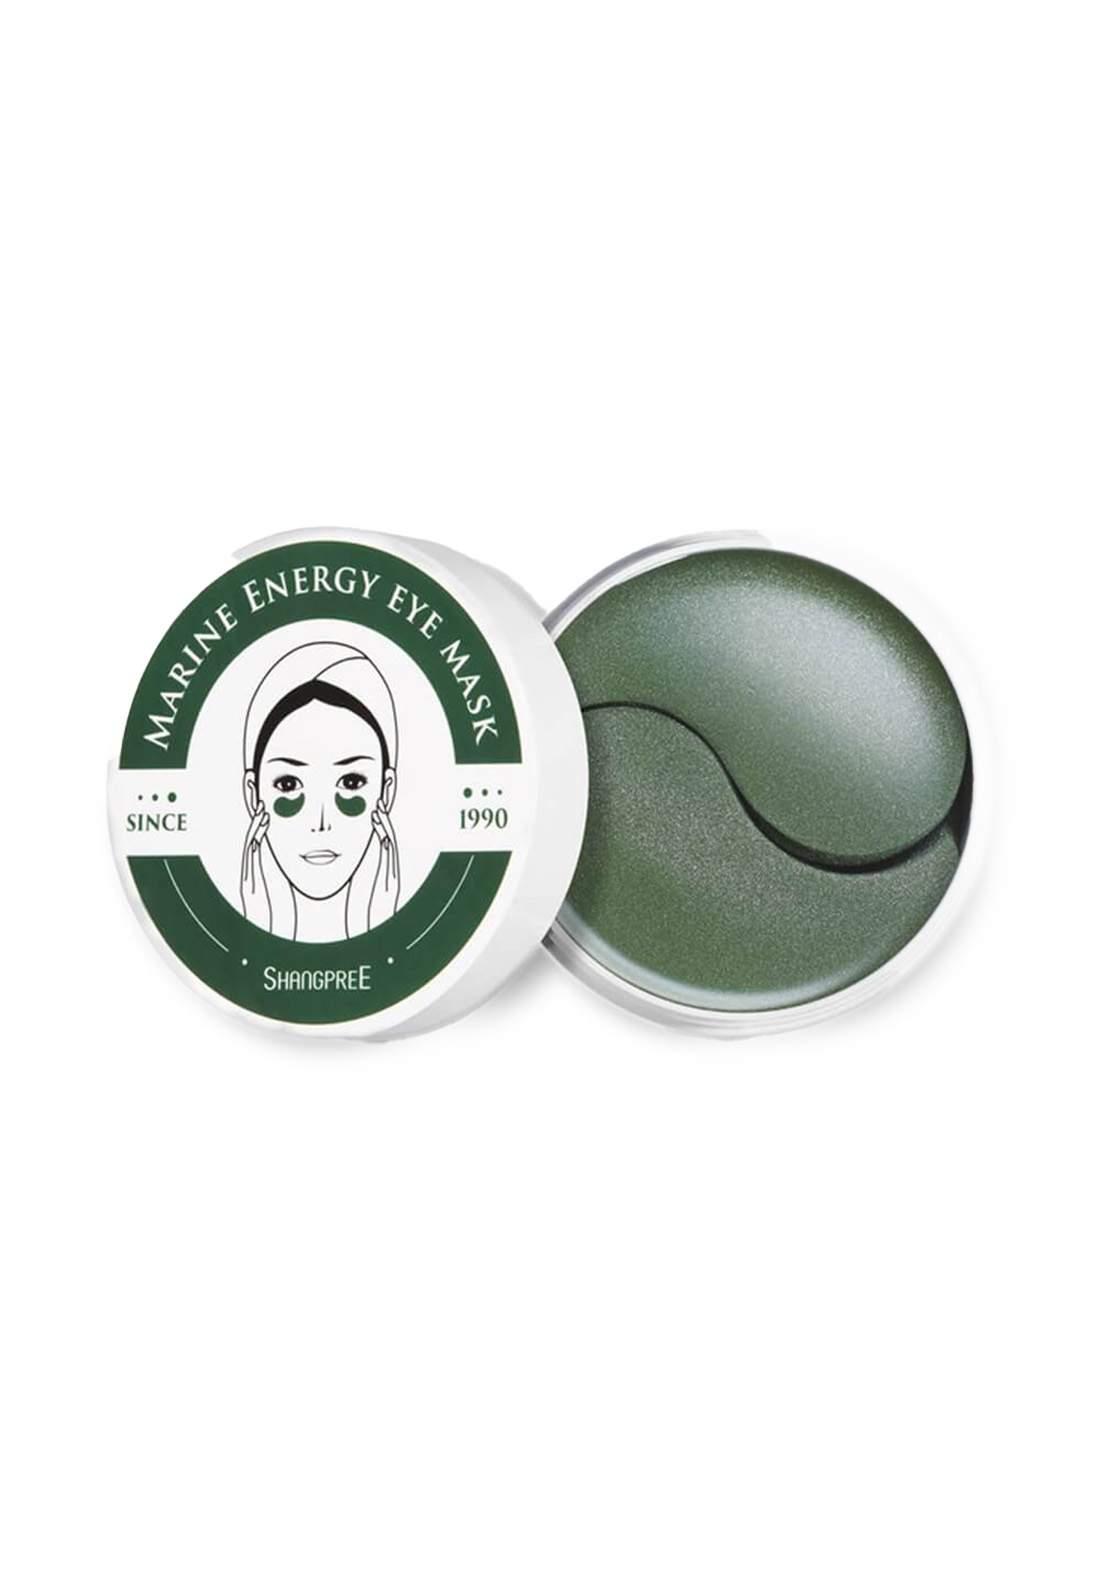 Shangpree Marine Energy Eye Mask 60 pcs قناع لتحت العين